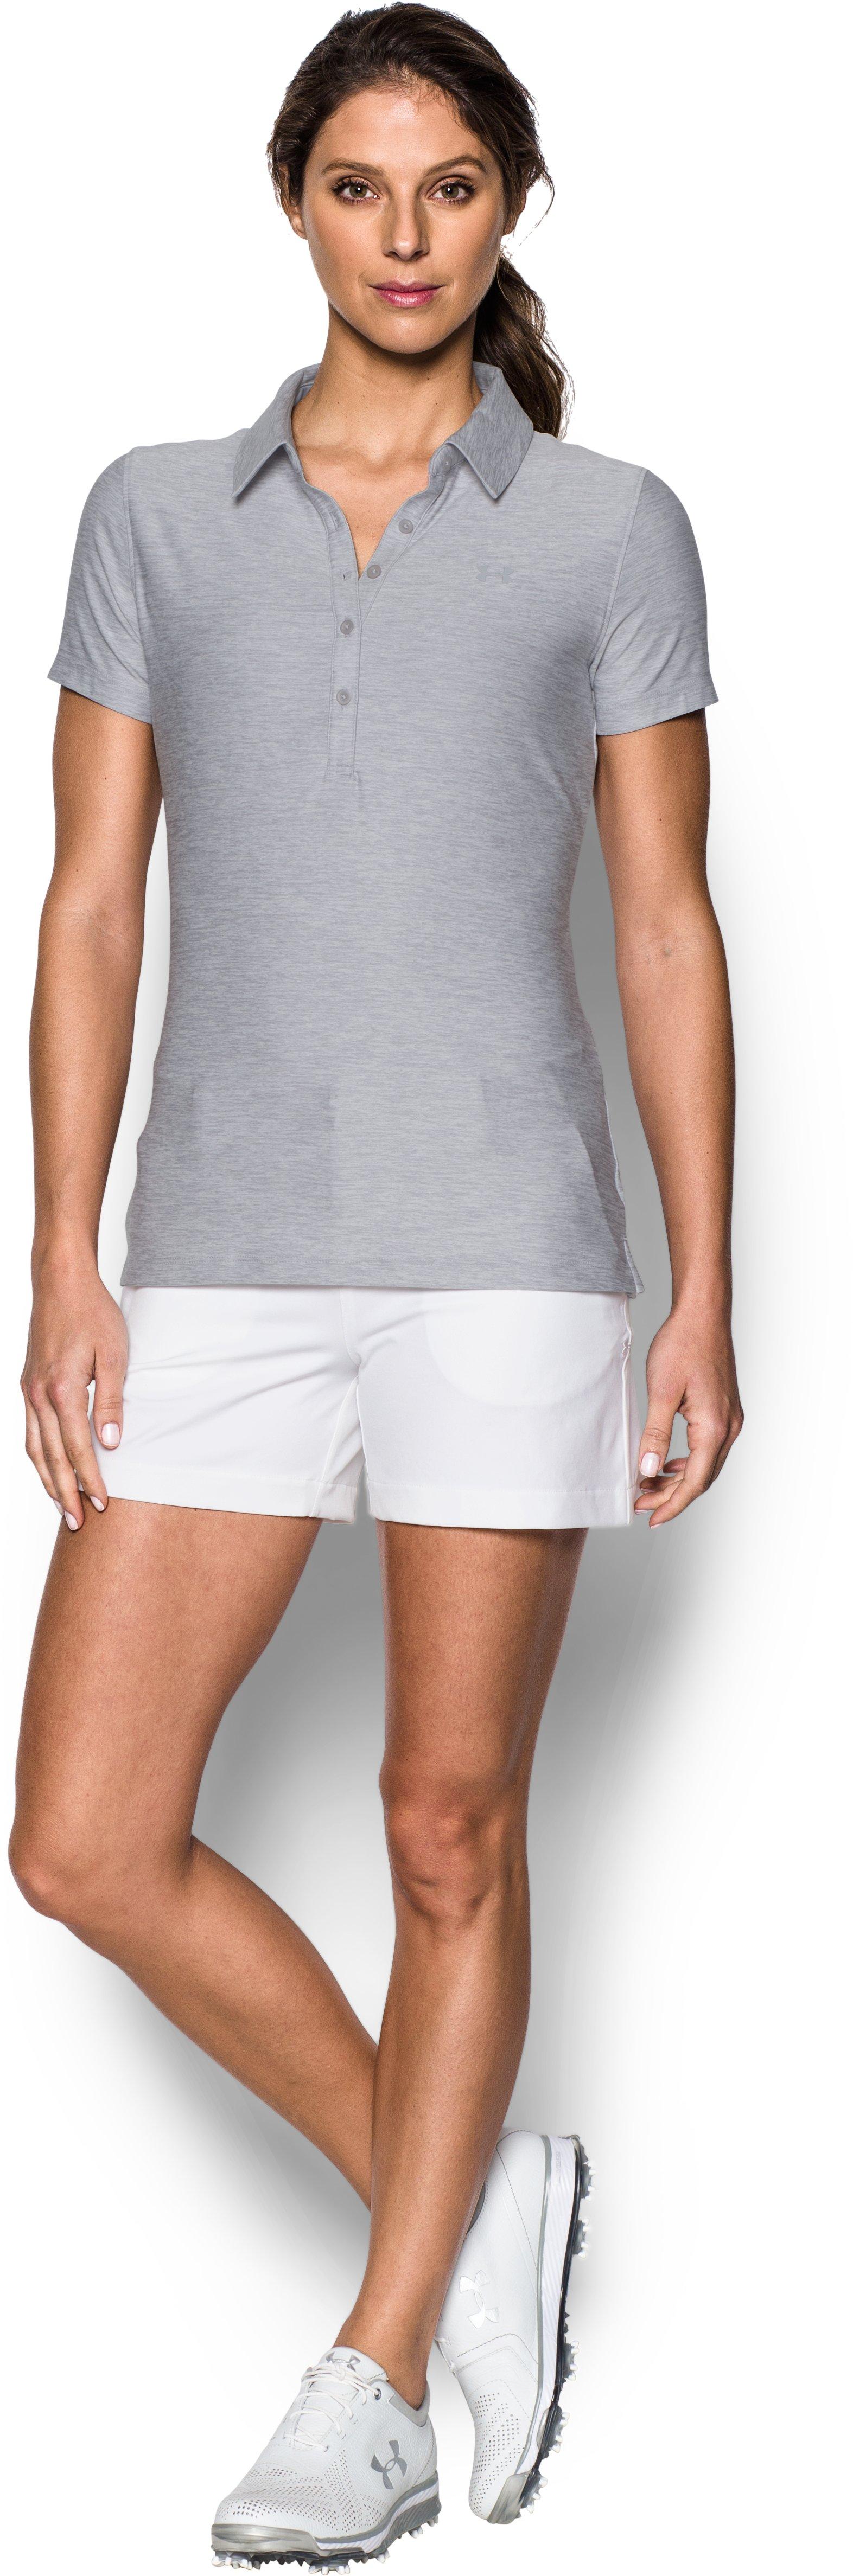 Women's Short Sleeve Shirts | Under Armour US